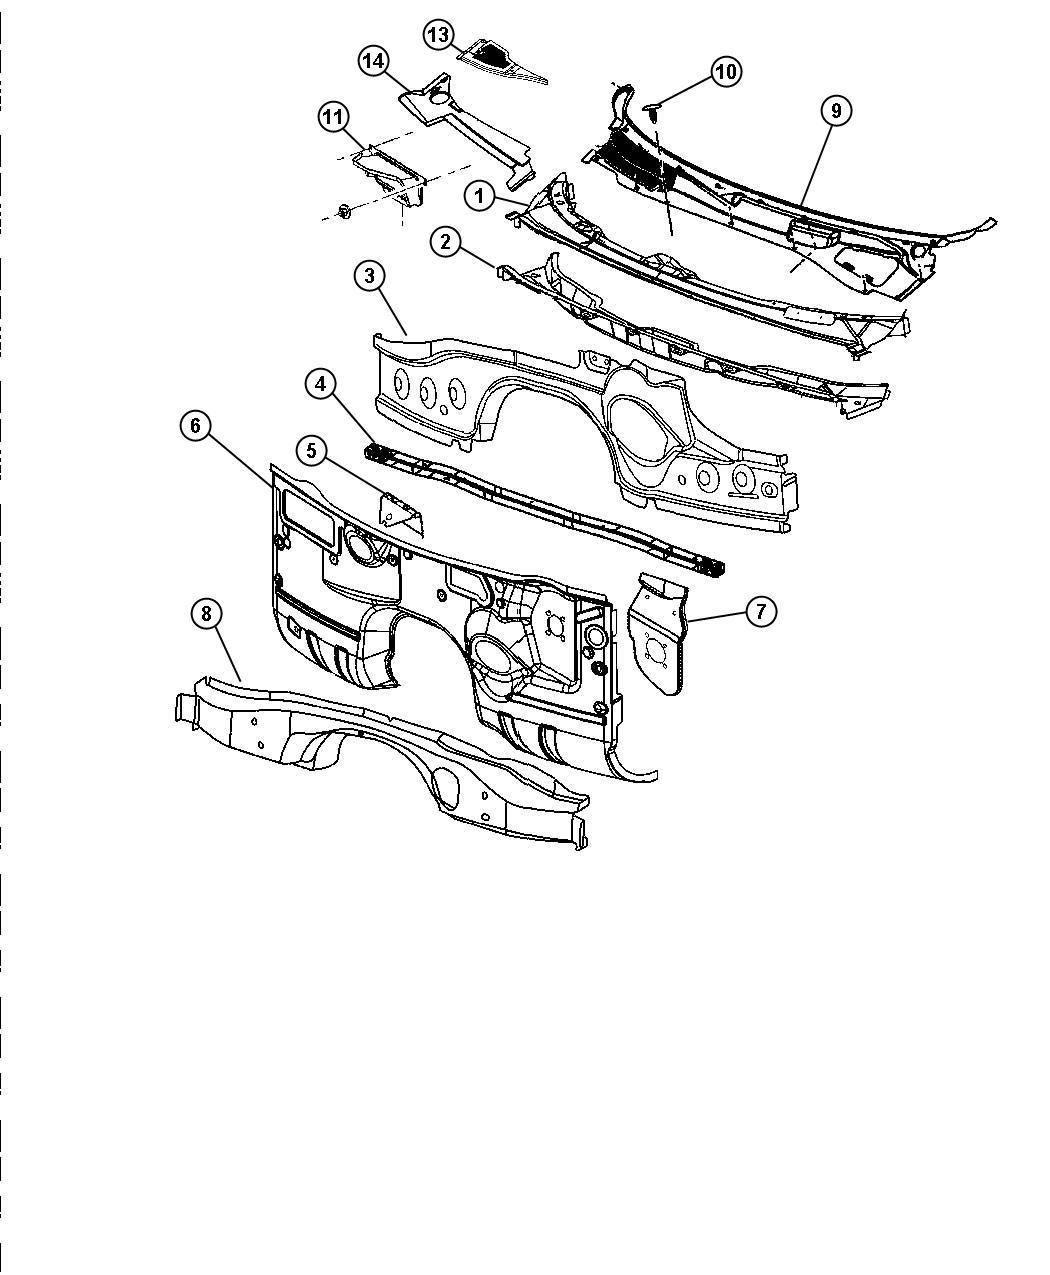 2013 Dodge Challenger R/T 5.7L V8 HEMI VVT, 6-Speed Manual